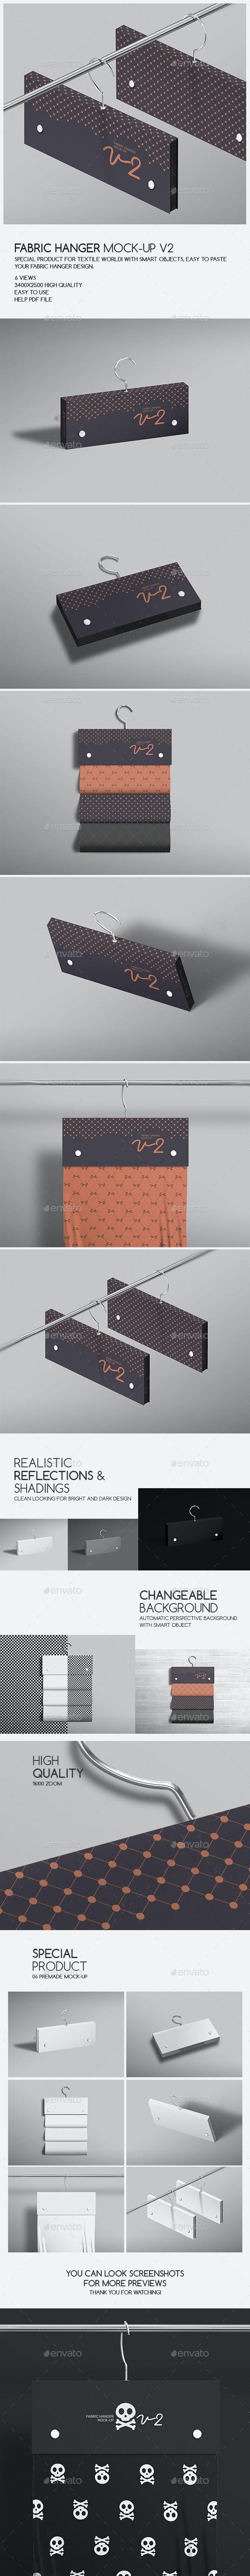 Fabric Hanger Mock-Up v2 - Product Mock-Ups Graphics